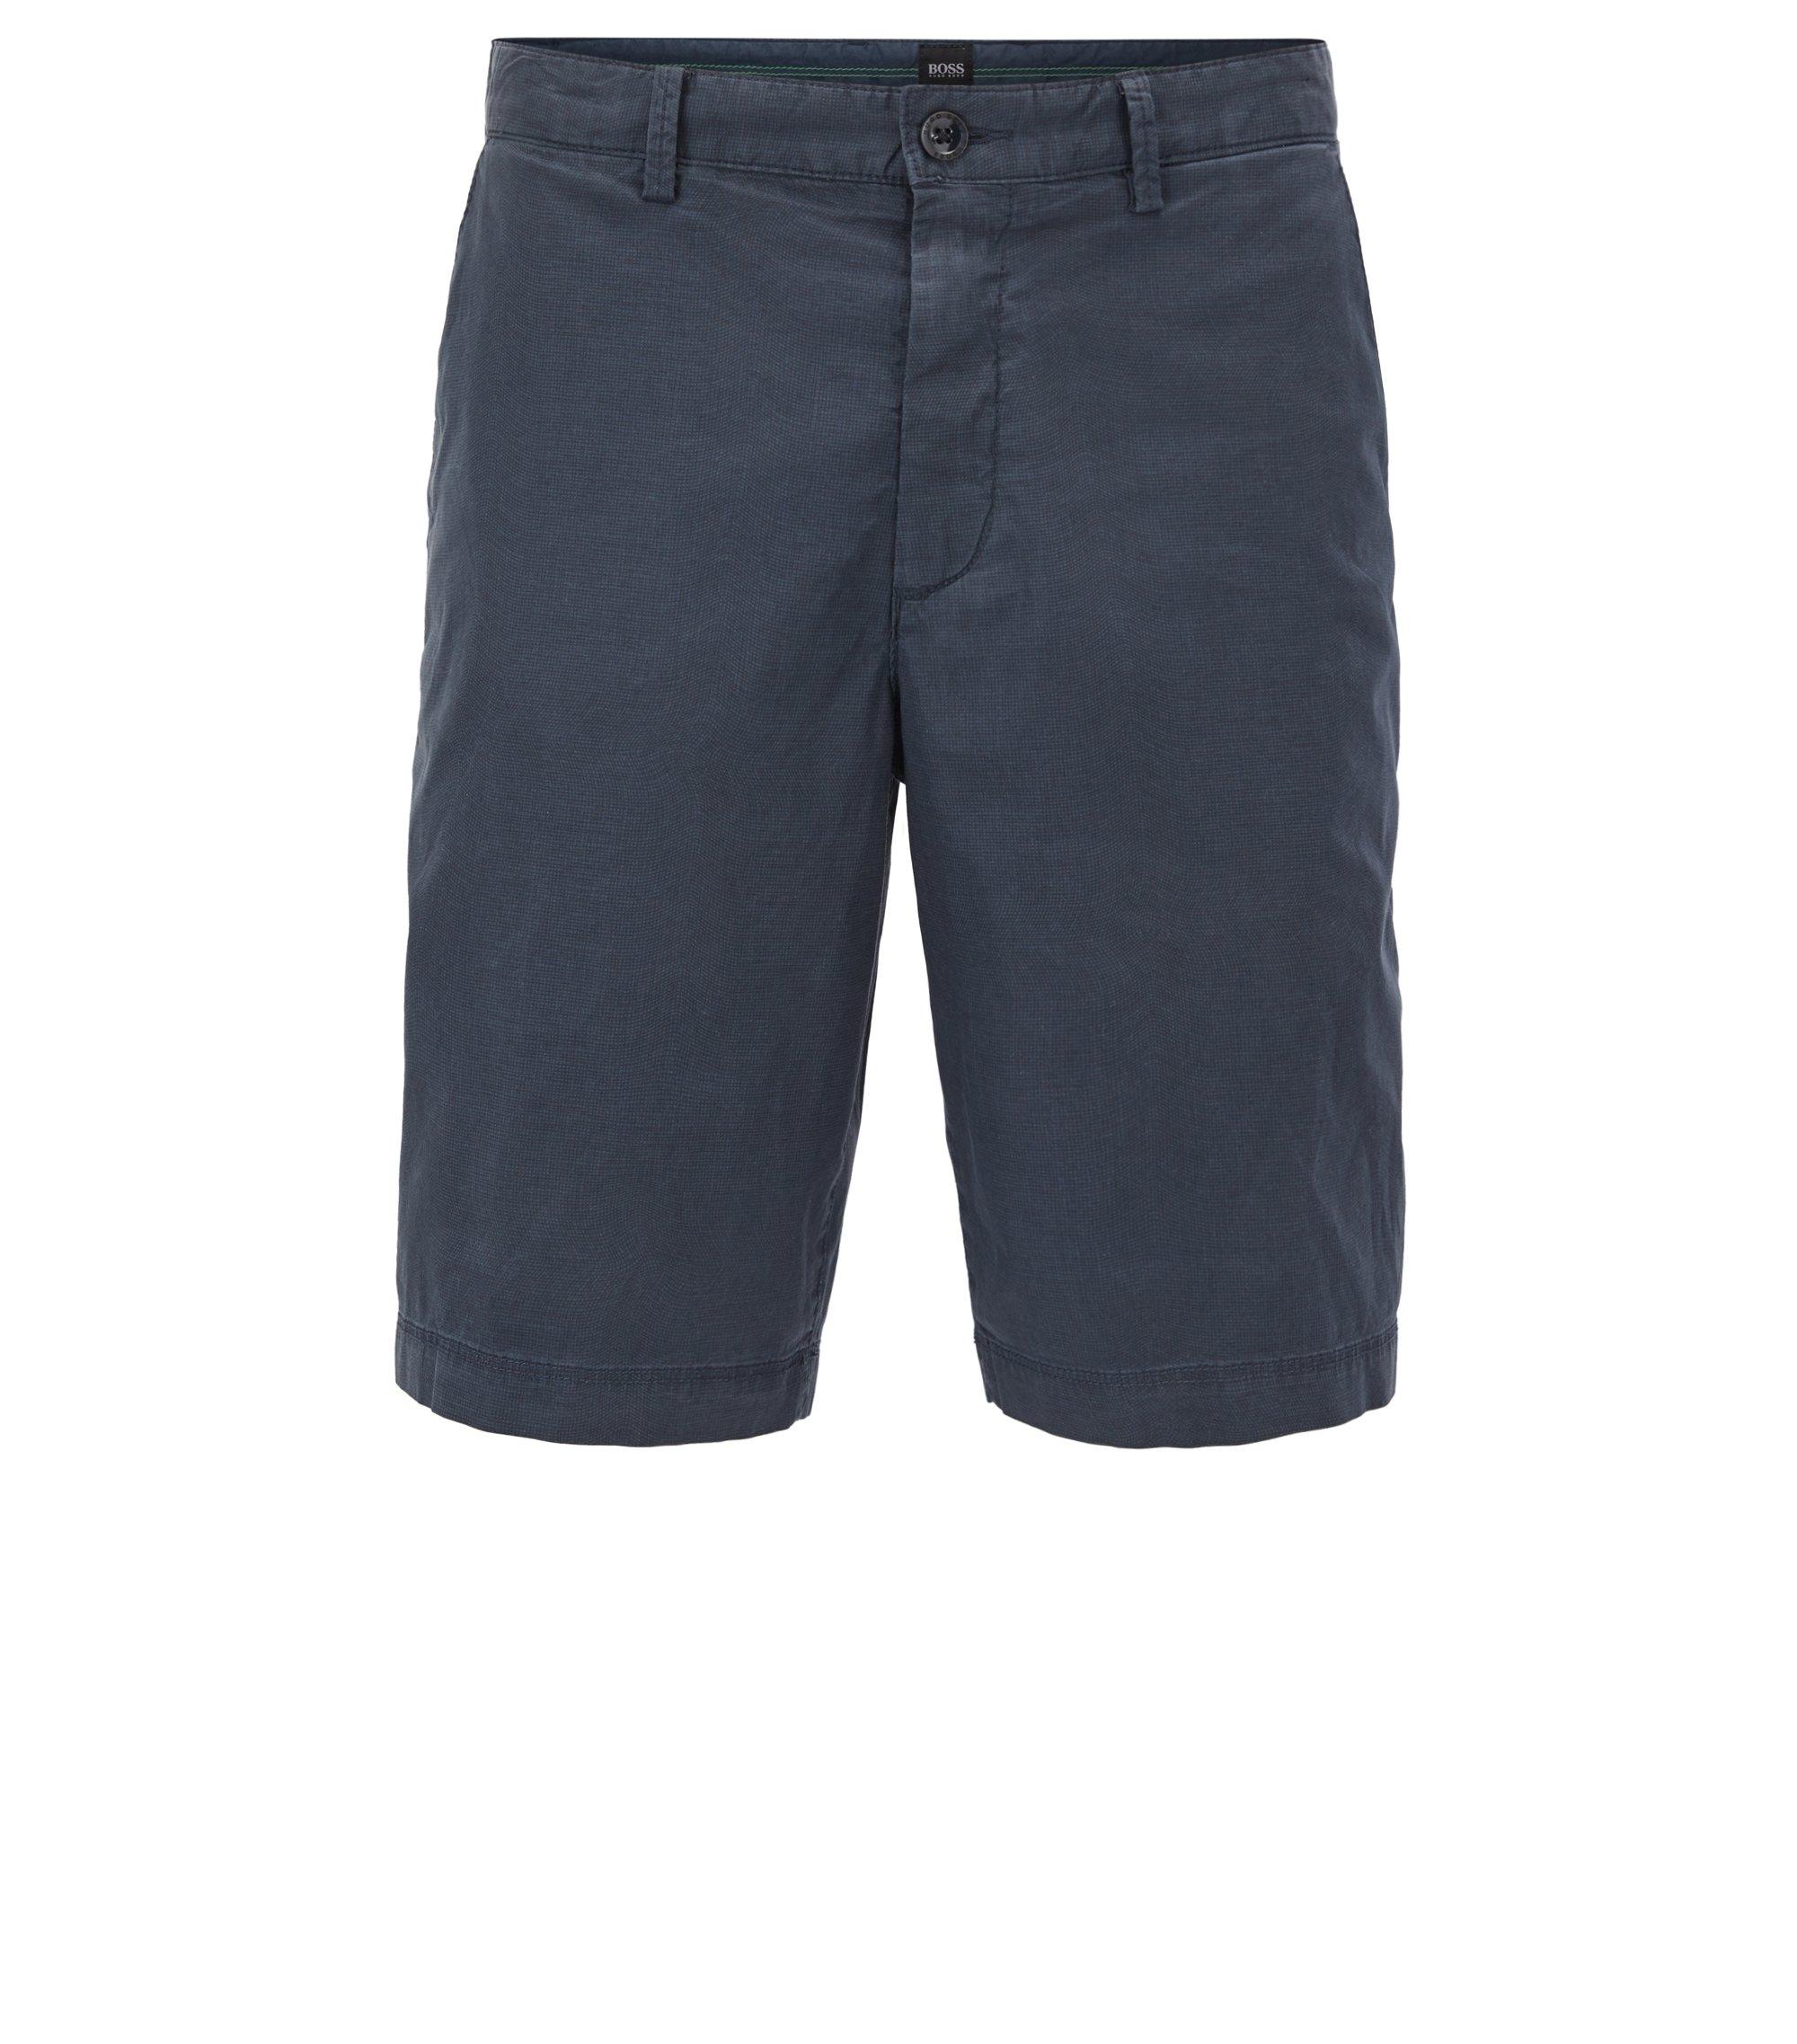 Shorts aus Stretch-Baumwolle mit filigranem Karomuster , Dunkelblau